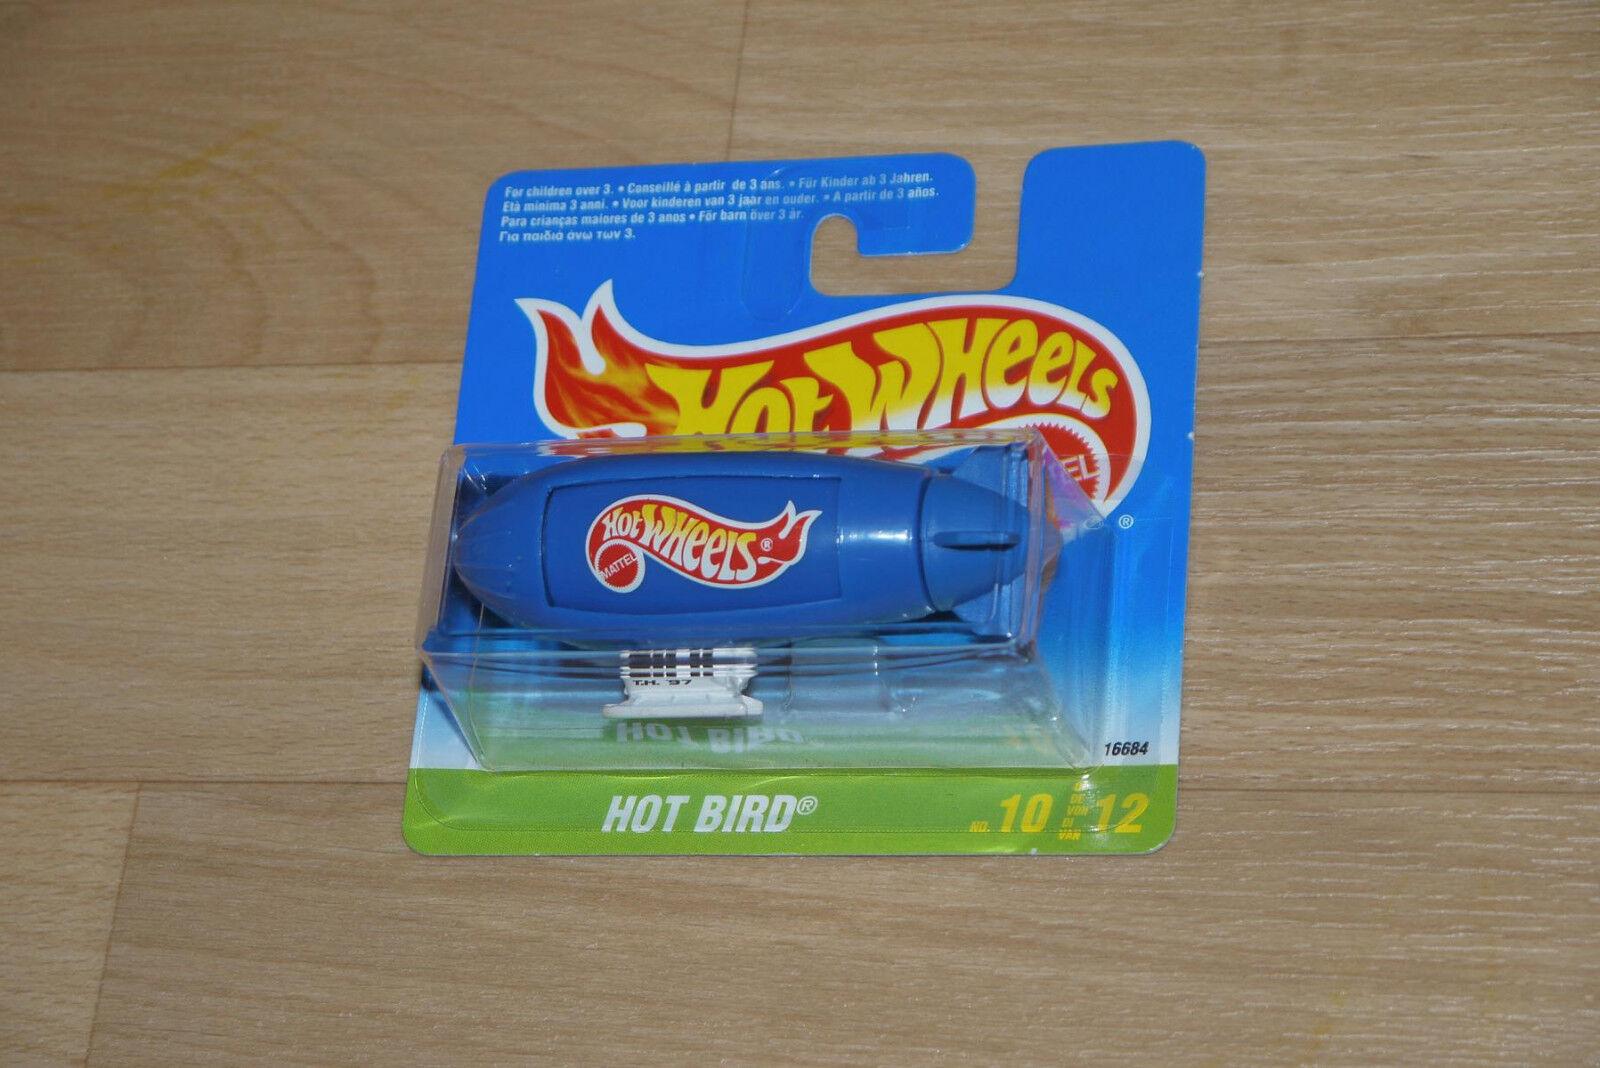 1997 Hot Wheels-Treasure Hunt-Blimp hot bird-short Coched-súper rara